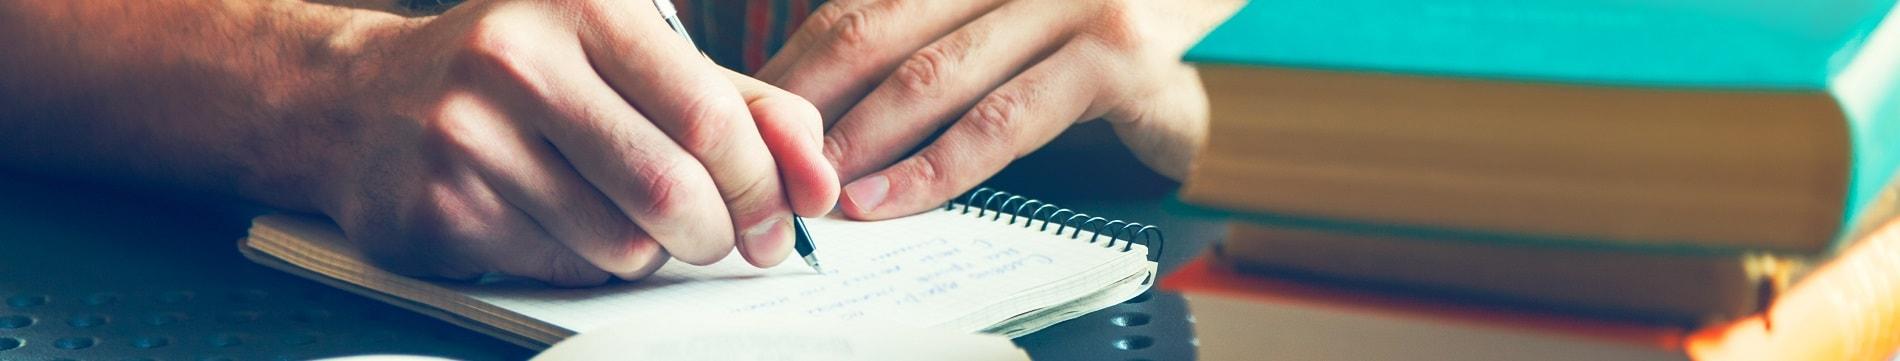 Top 101 Best Persuasive Essay Topics in 2017 PrivateWriting